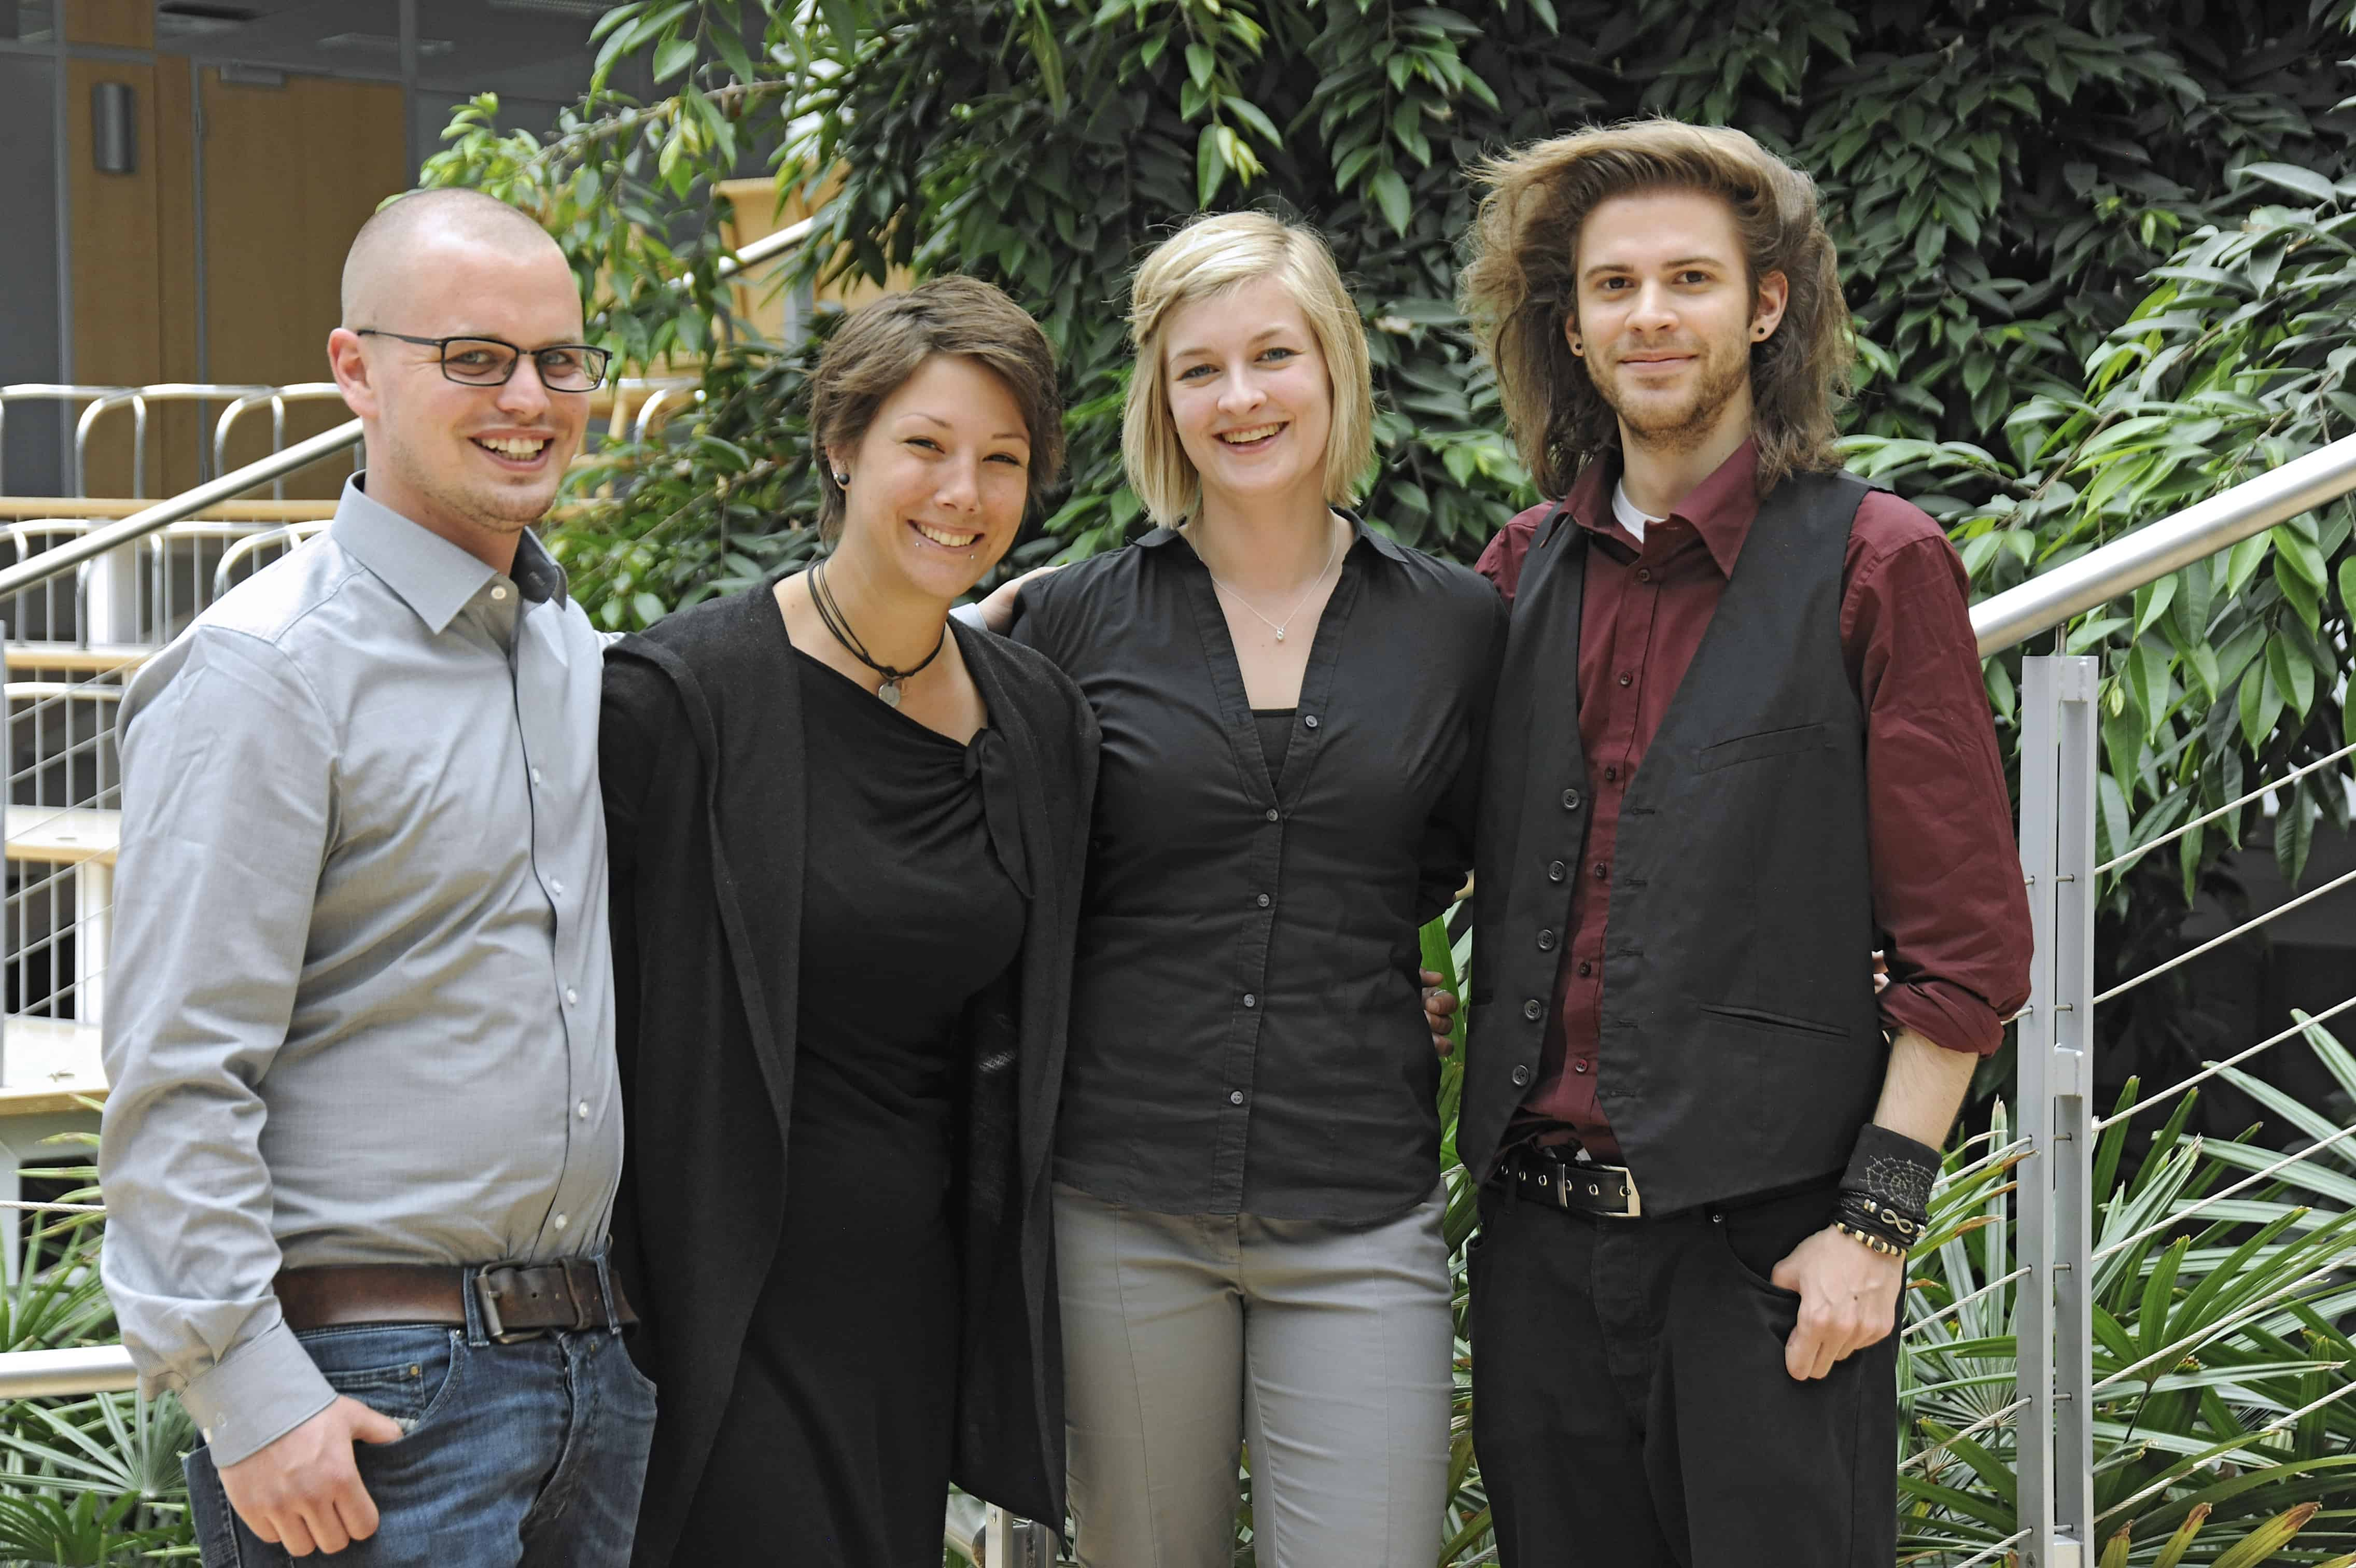 Gruppenbild Team der Hochschule Aalen